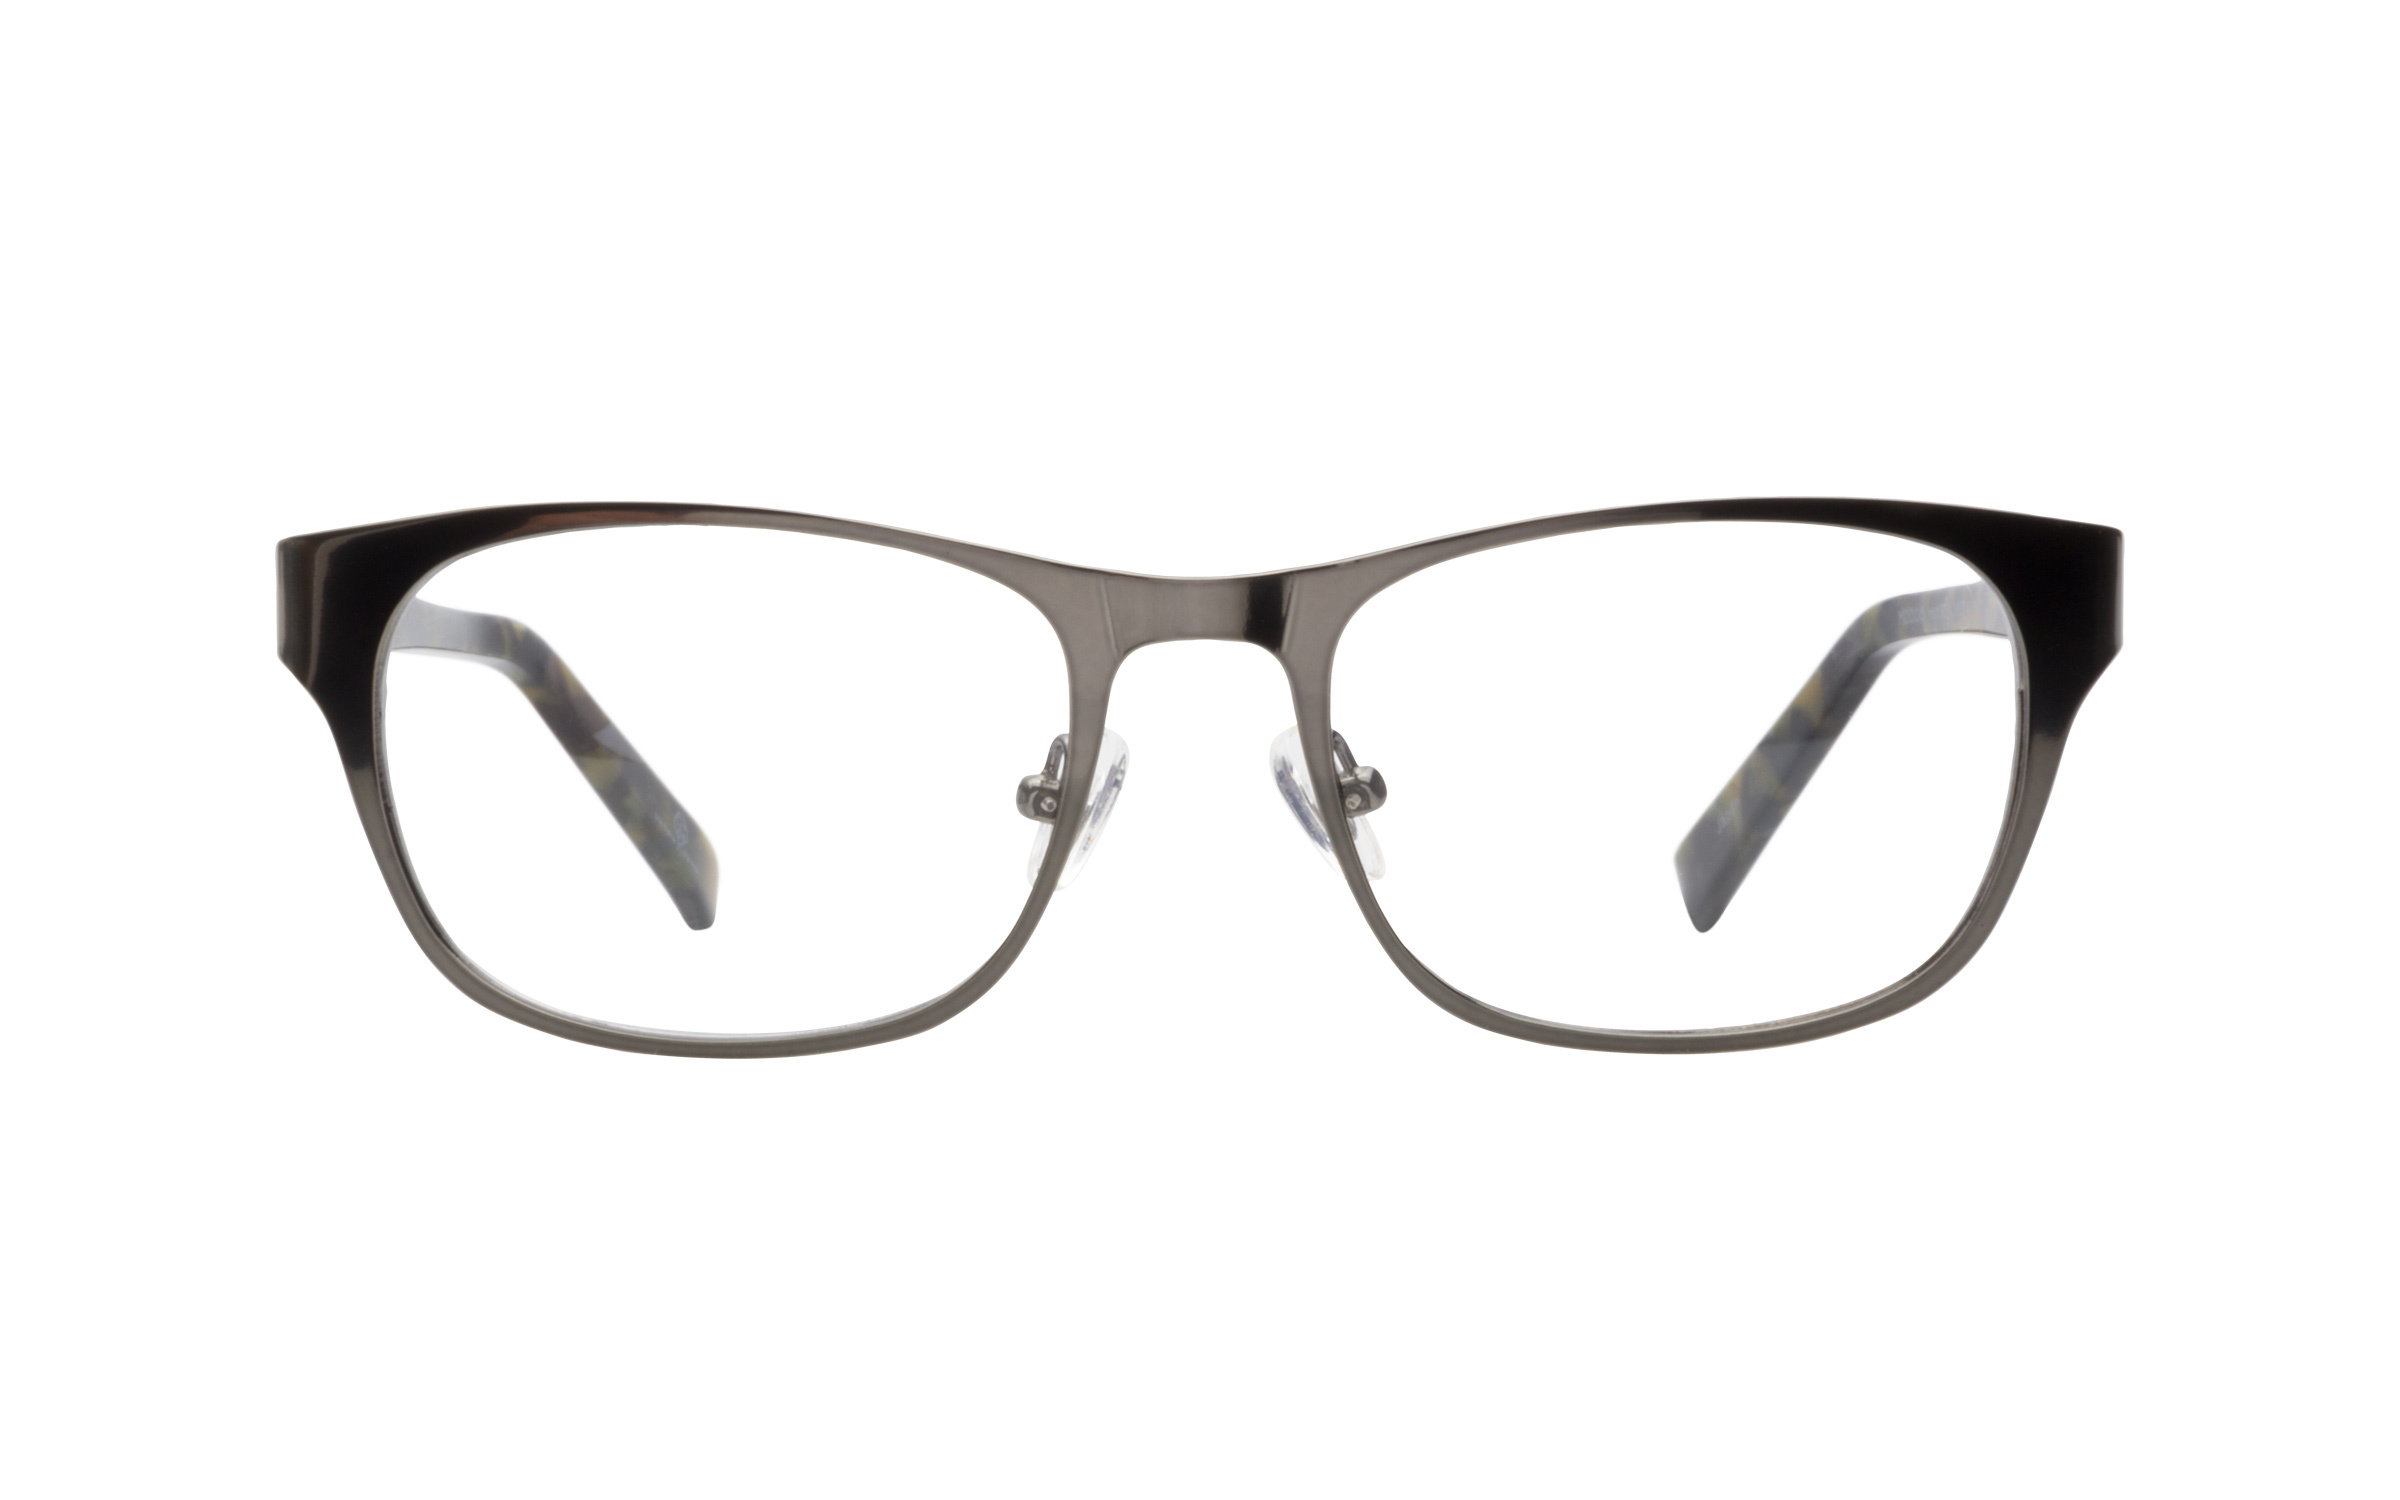 Modo 8001 Eyeglasses and Frame in Olive Green | Acetate/Metal - Online